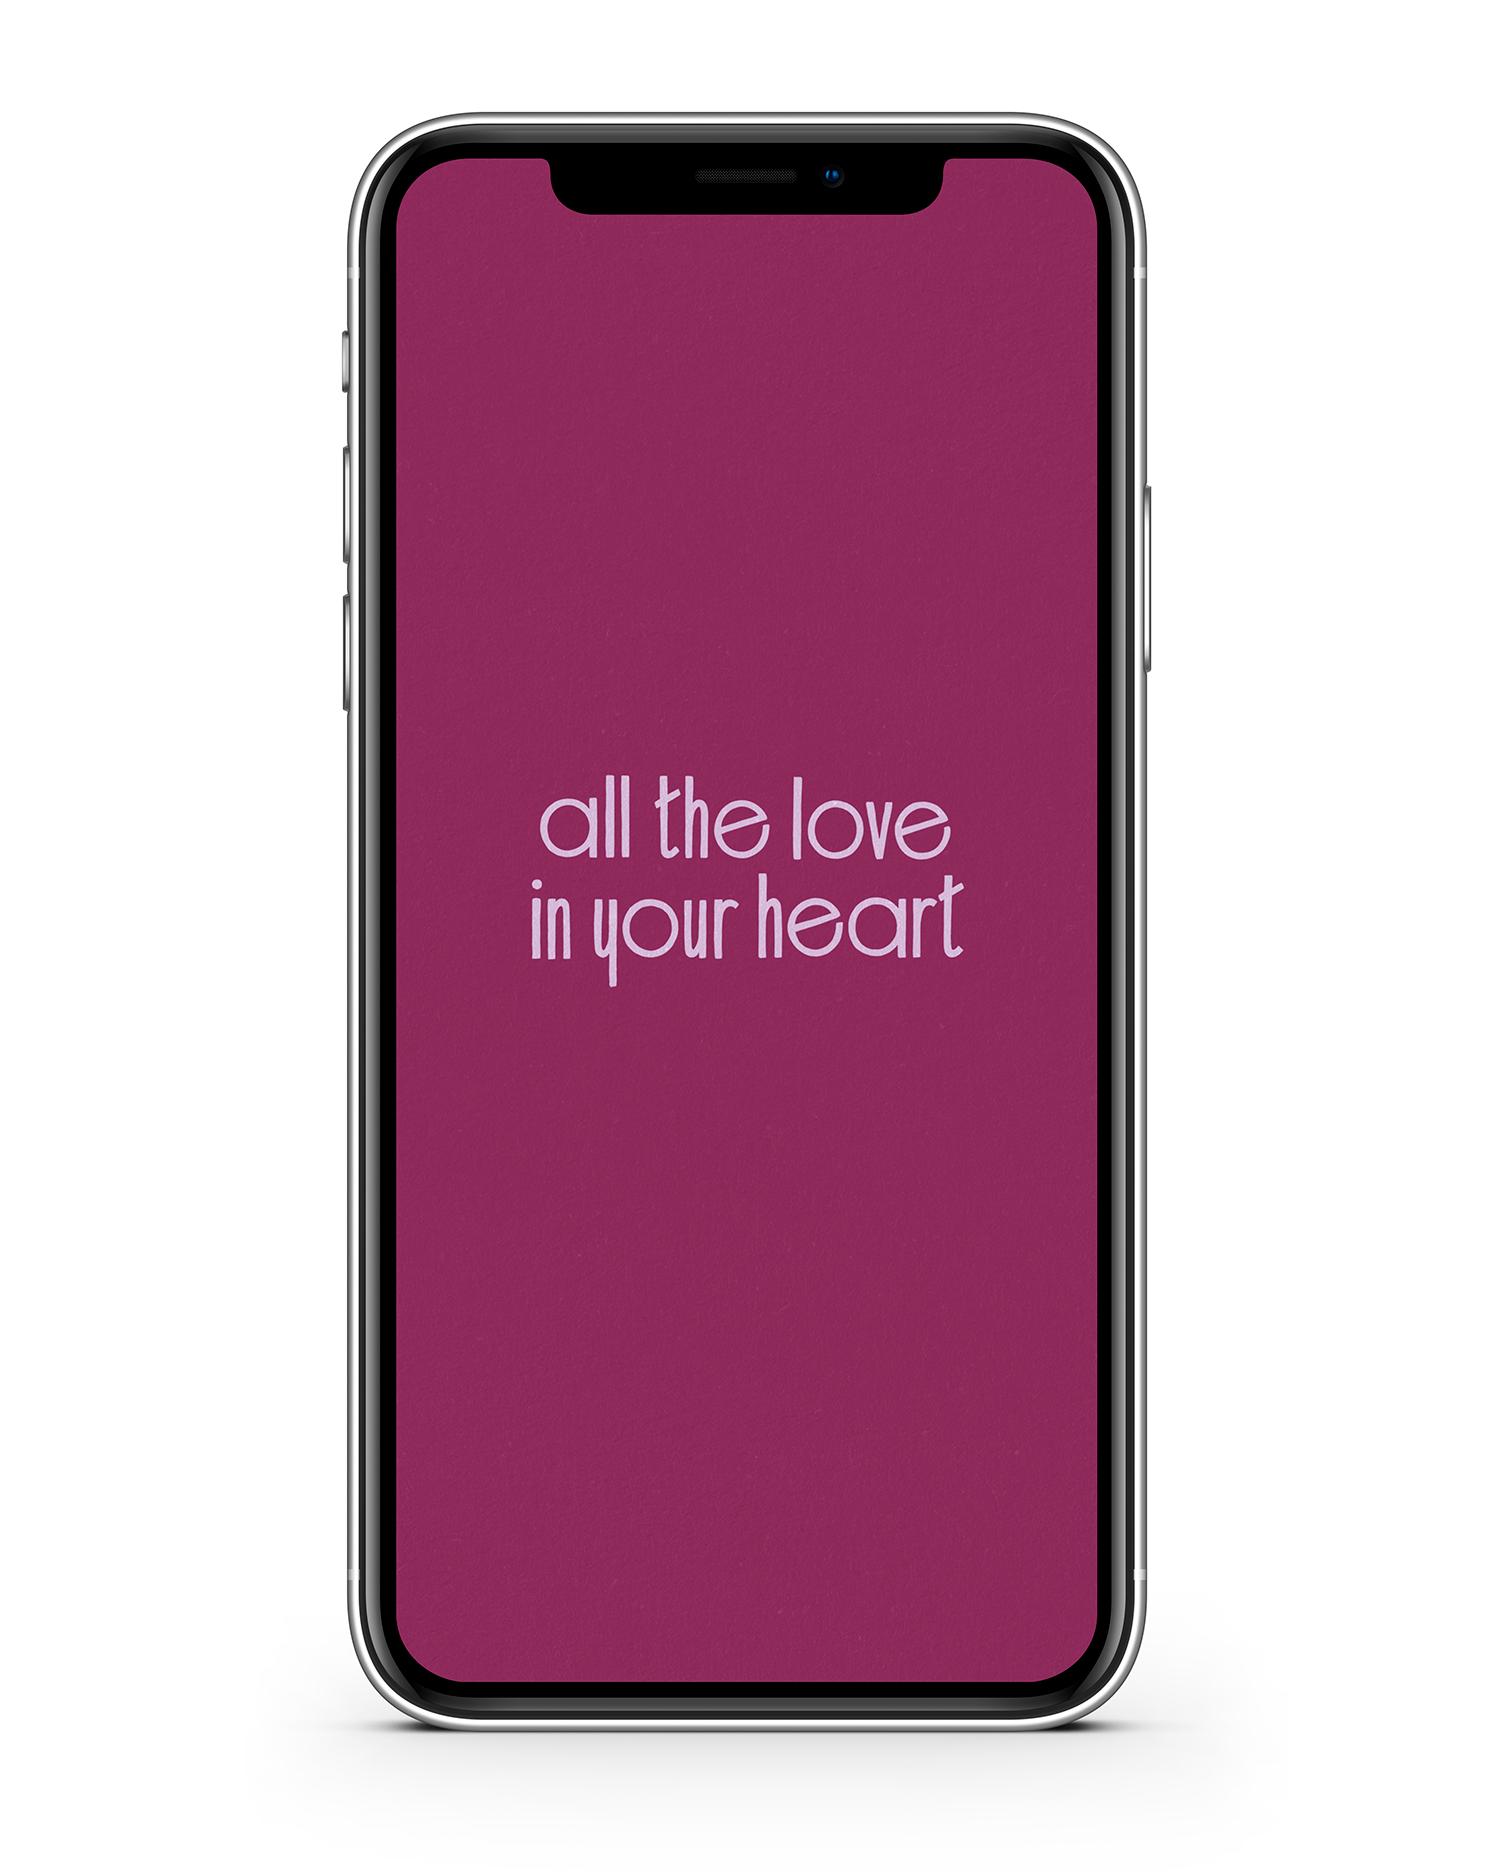 Beautiful Carole King Lyrics Phone Wallpaper